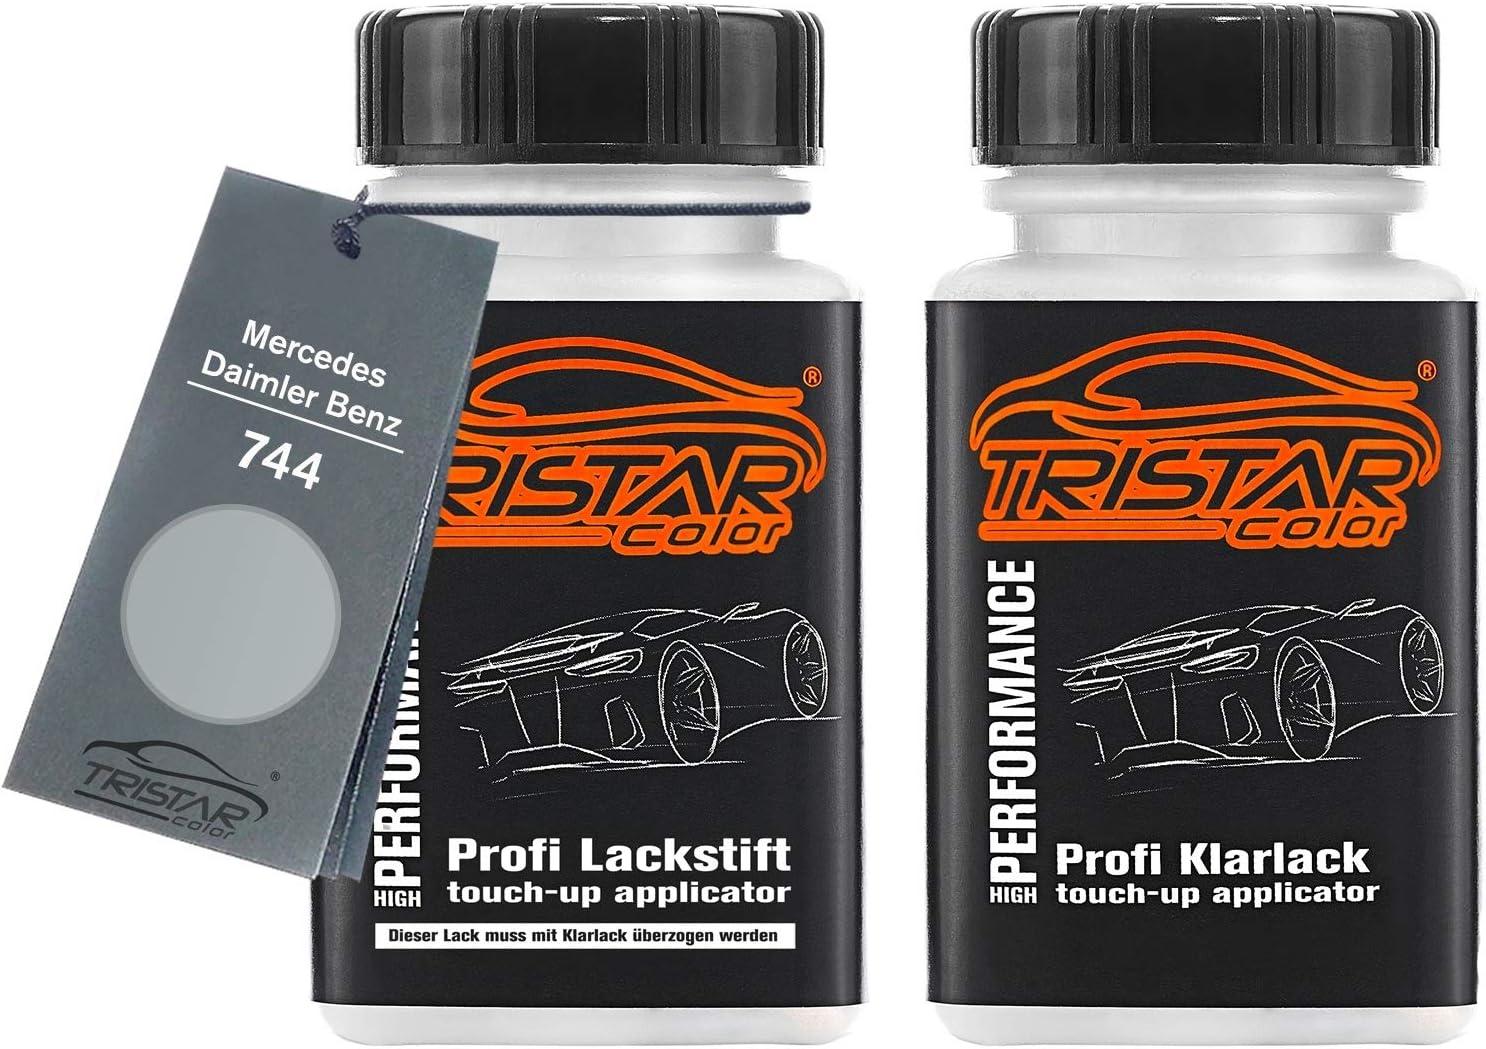 Tristarcolor Autolack Lackstift Set Für Mercedes Daimler Benz 744 Brillantsilber Metallic Basislack Klarlack Je 50ml Auto